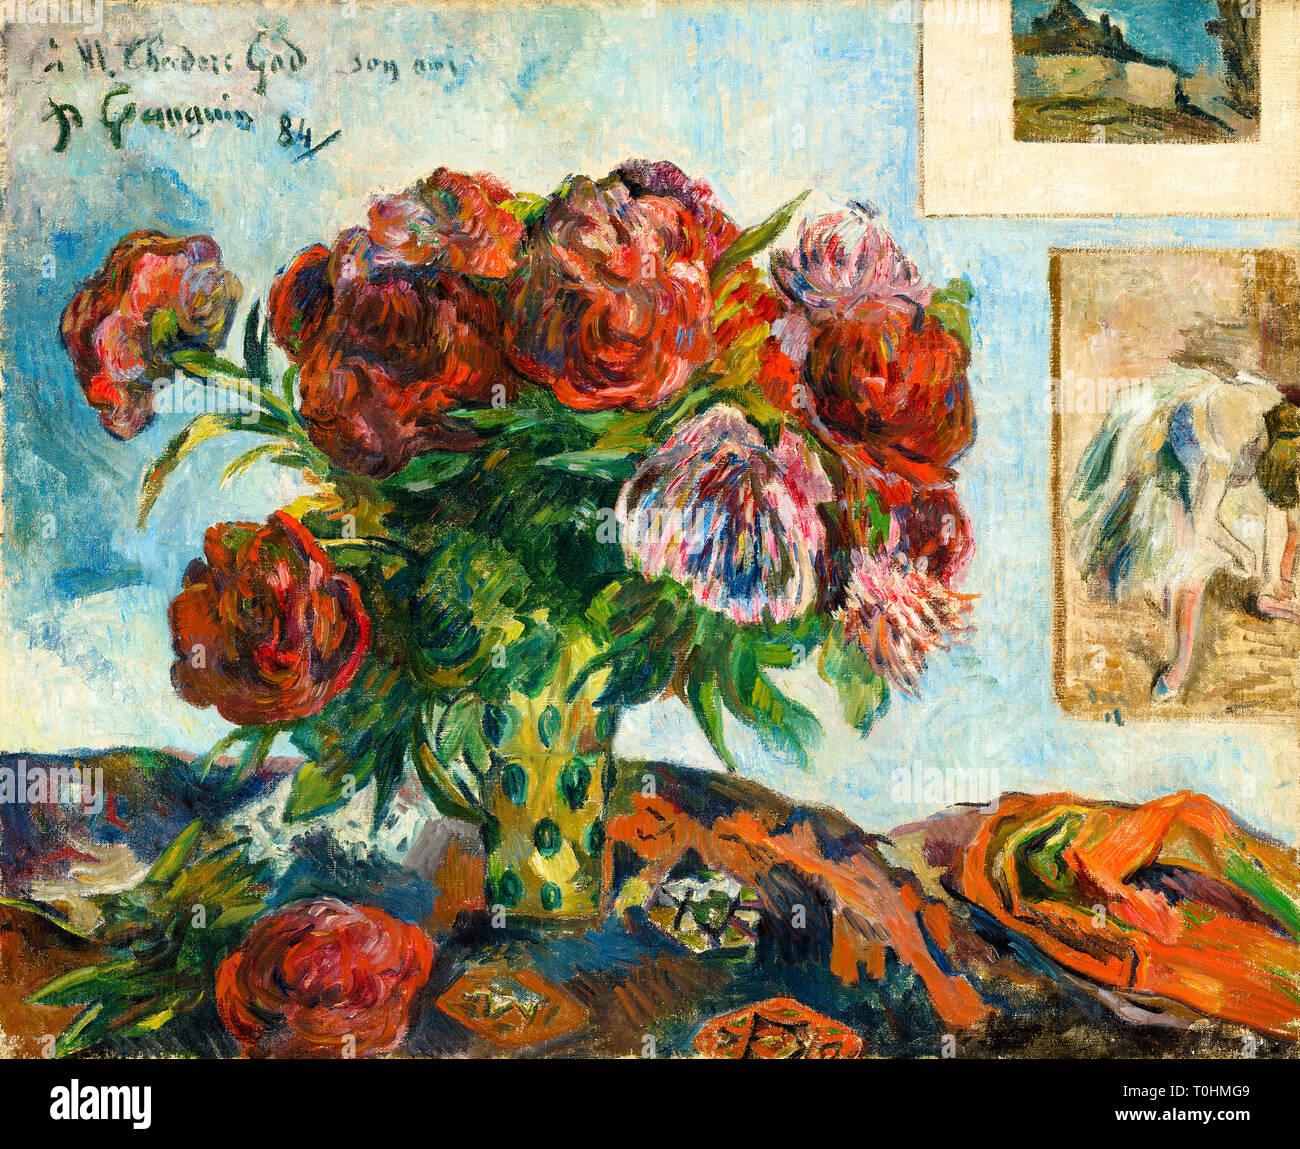 Paul Gauguin, Stillleben mit Pfingstrosen, Malerei, 1884. Stockbild